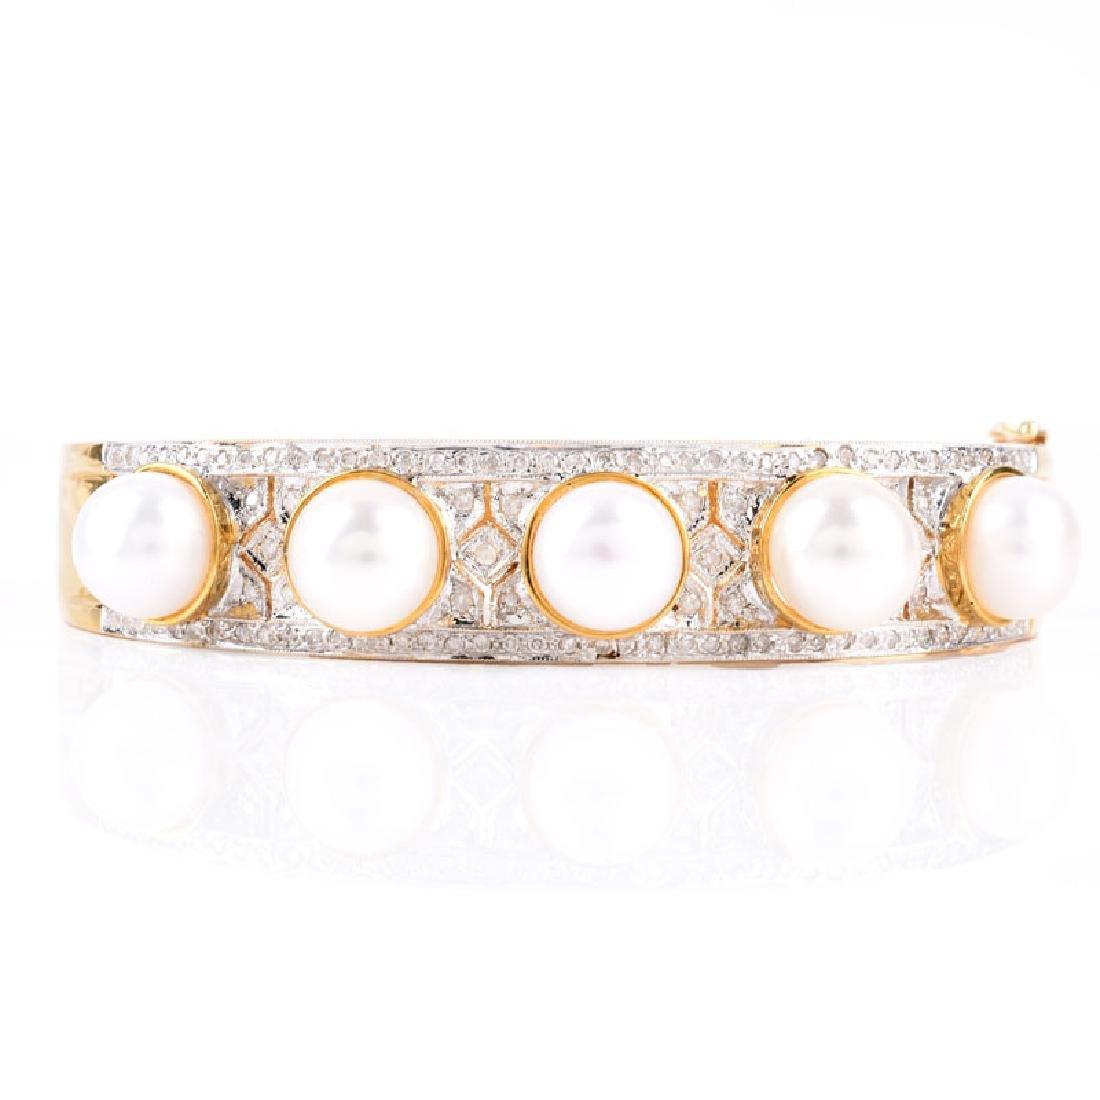 Micro Pave Set Diamond, Pearl and 14 Karat Yellow Gold